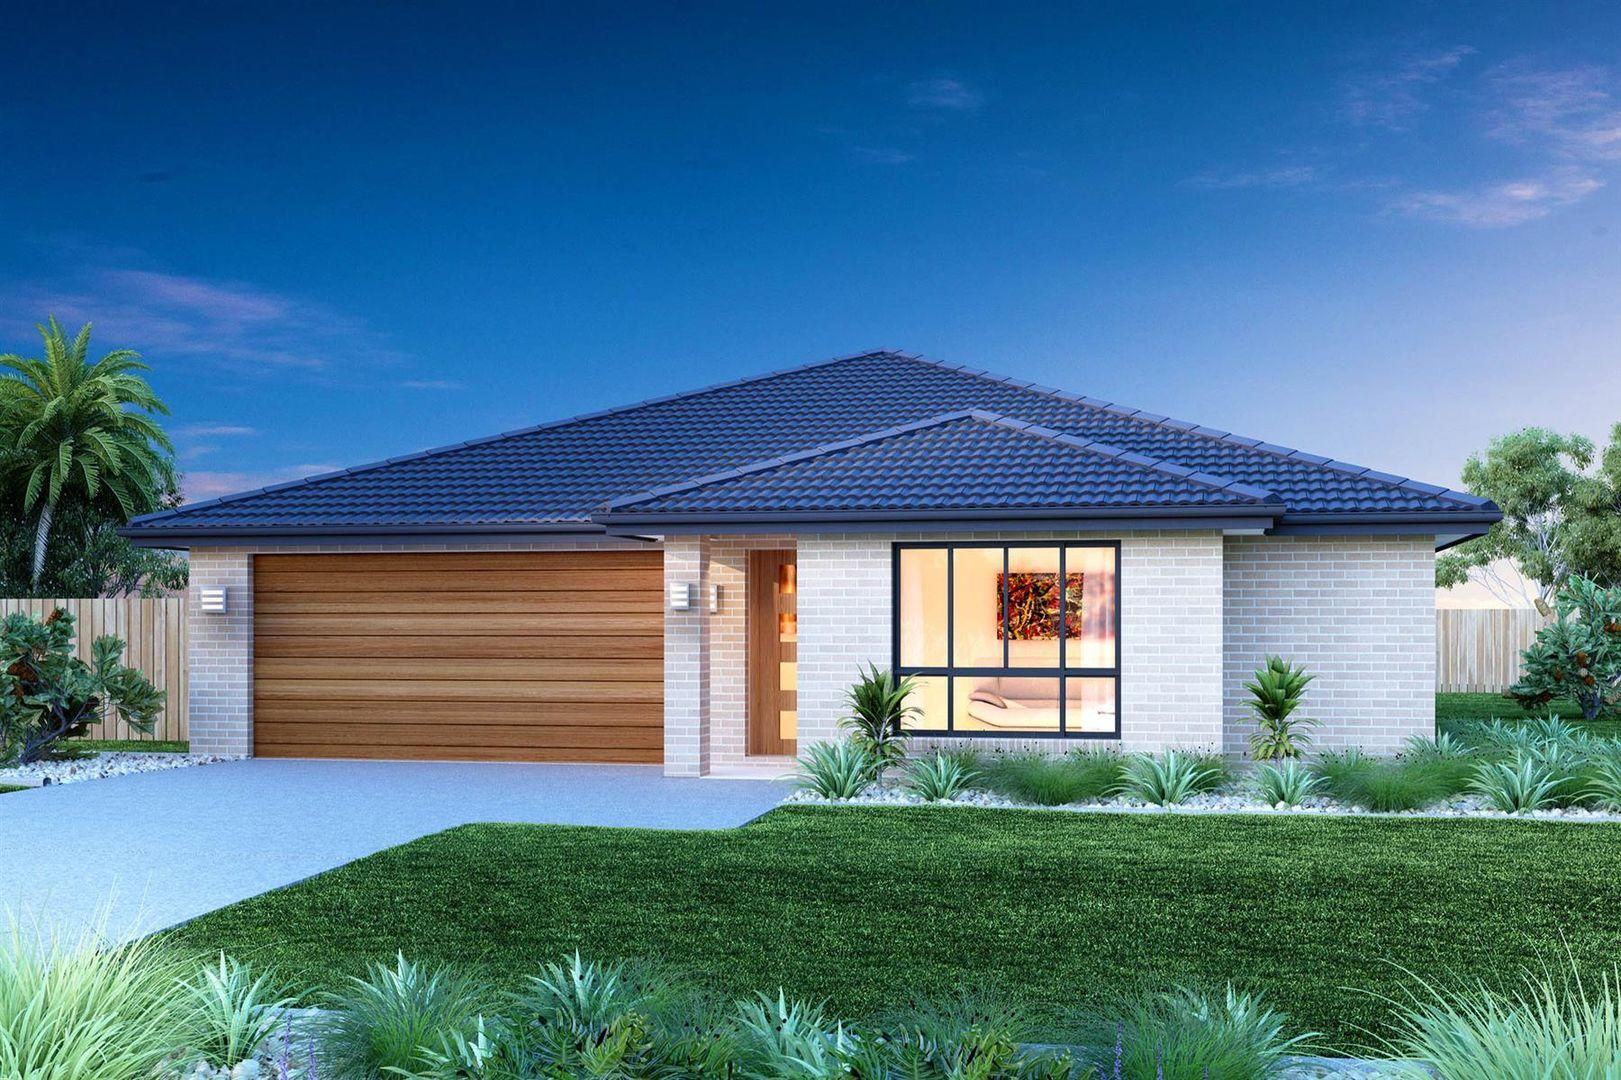 Lot 23 Parklane Esttate, Harlaxton QLD 4350, Image 0